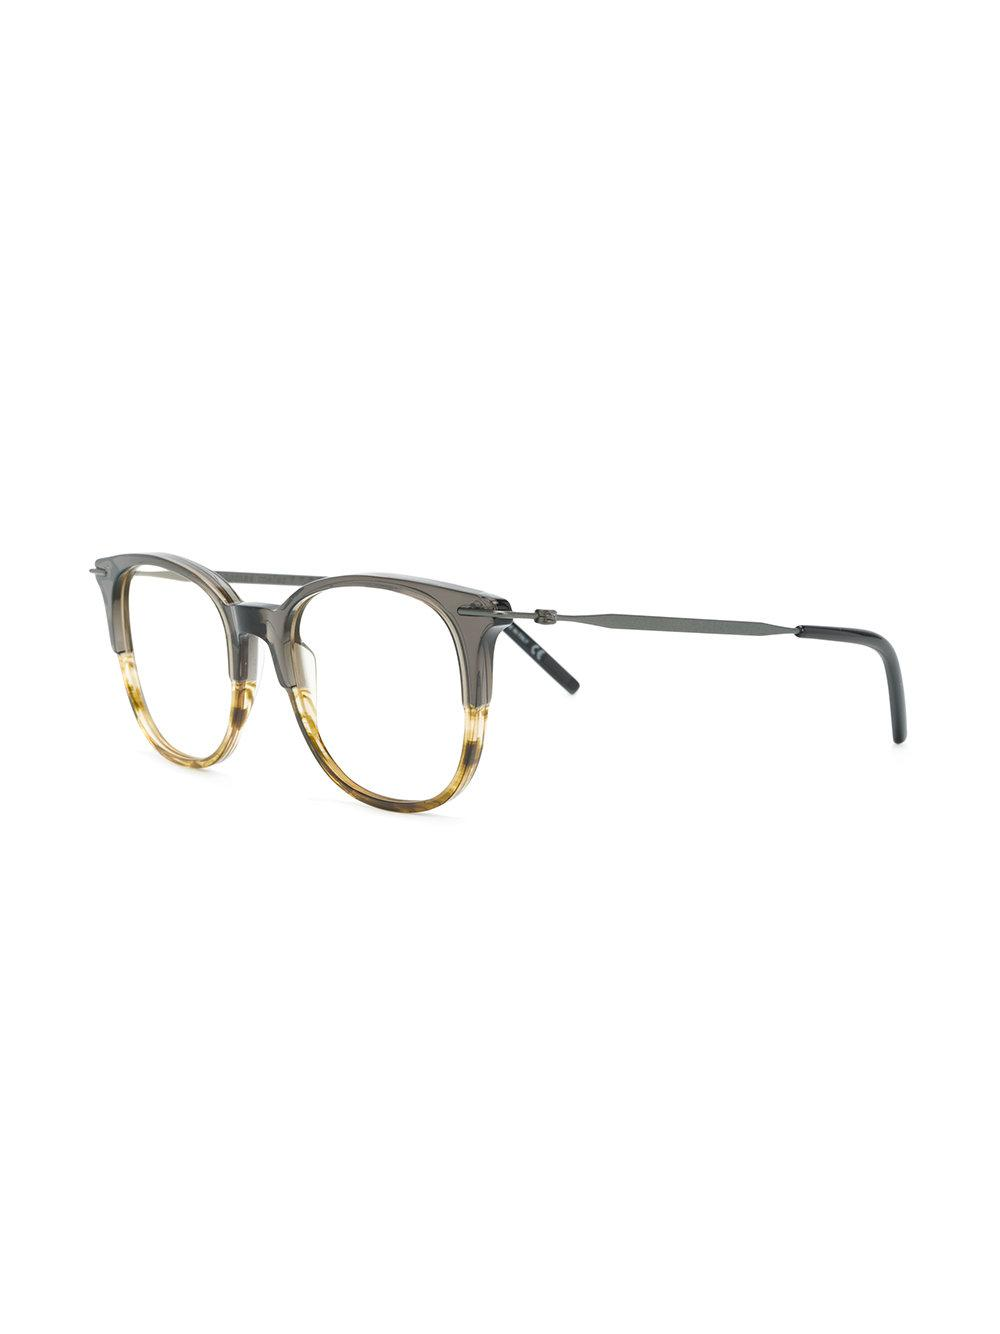 a7187ba61ef Tomas Maier - Green Square Glasses - Lyst. View fullscreen